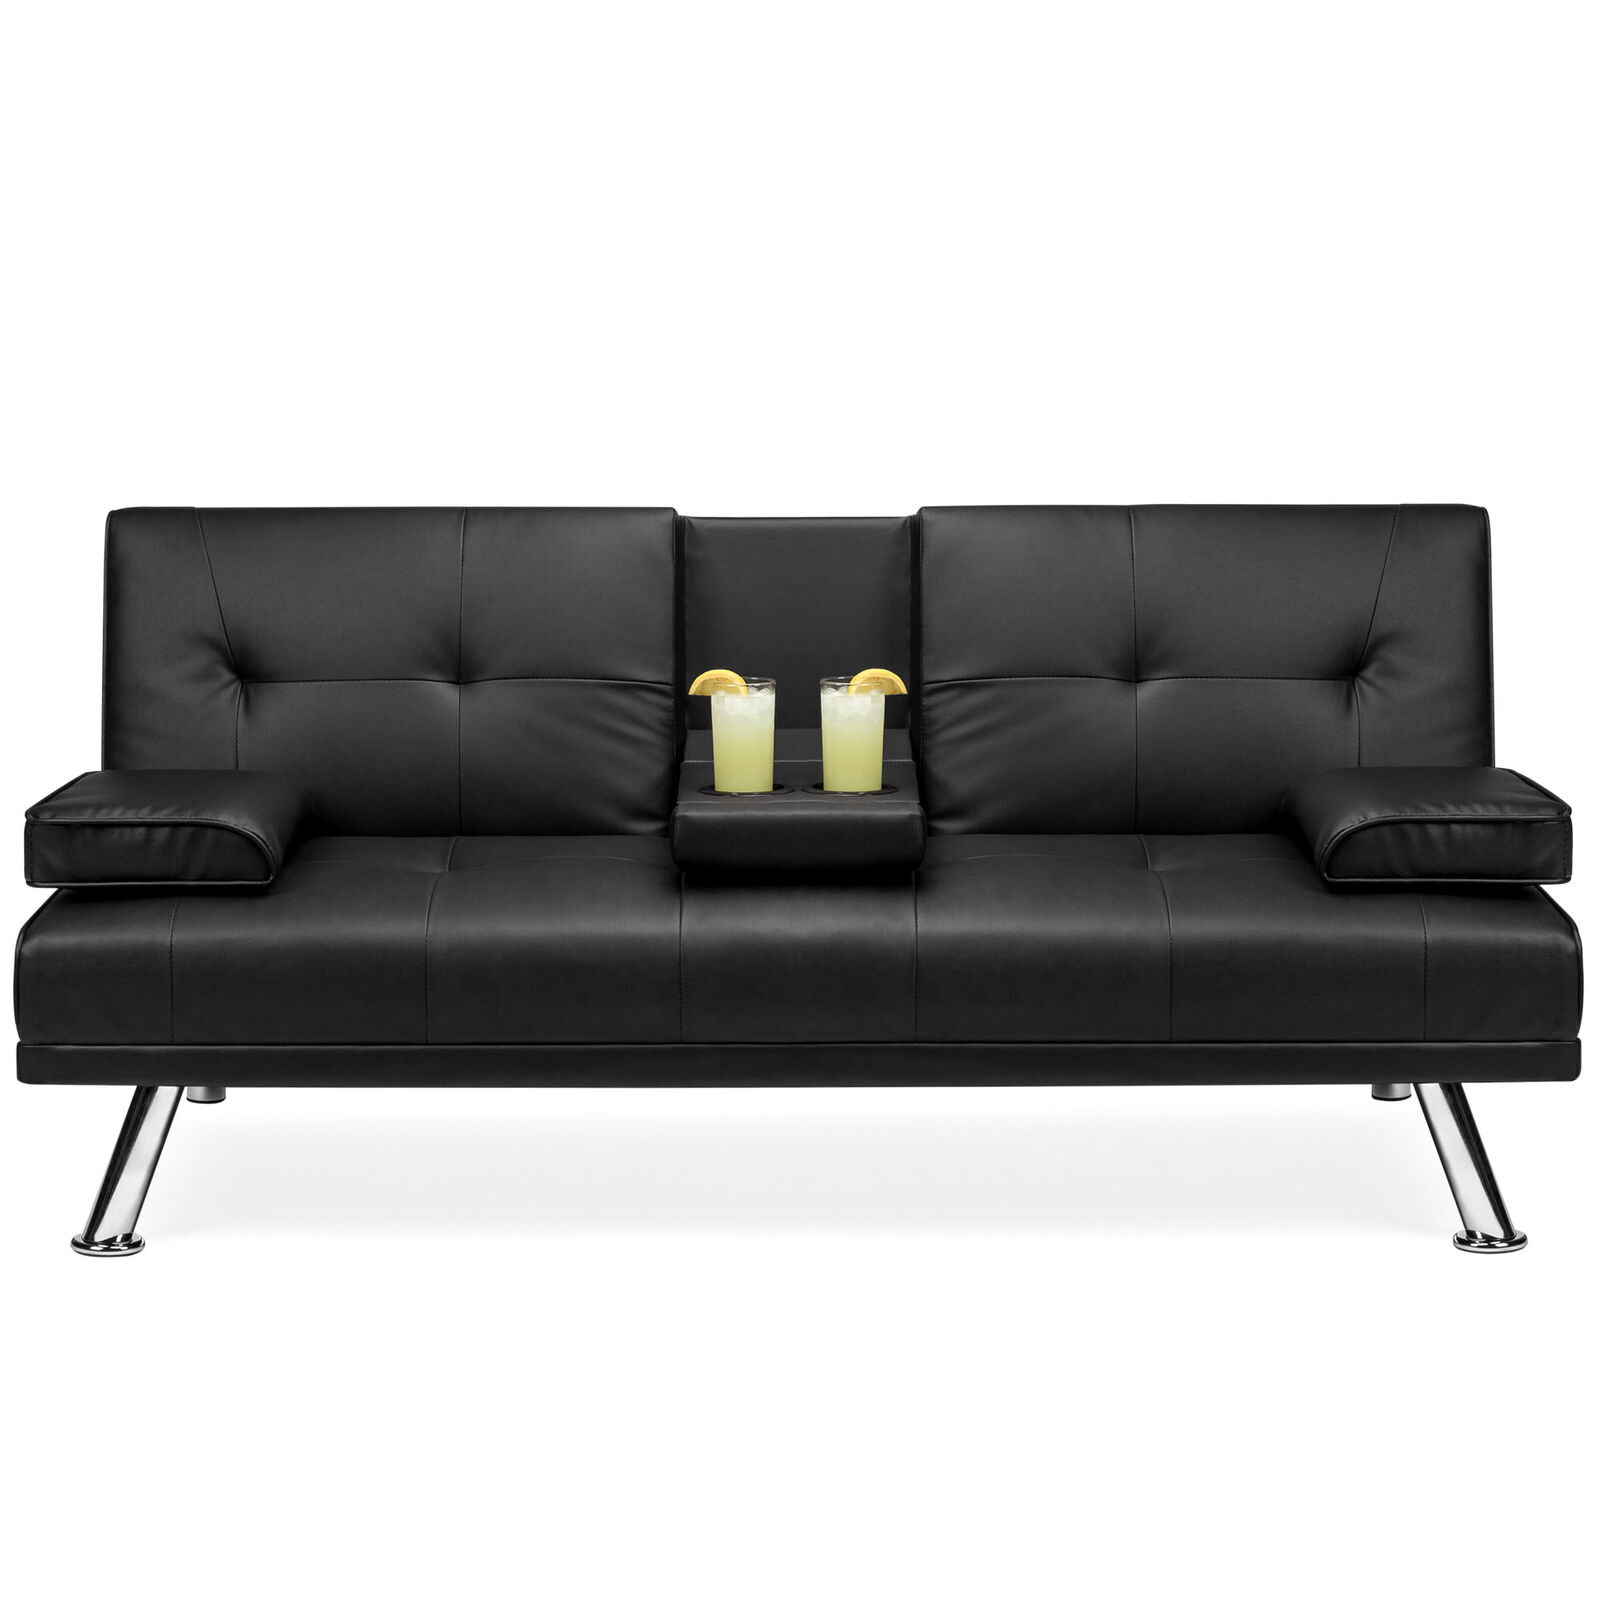 Best Choice Products Sky2878 Futon Sofa